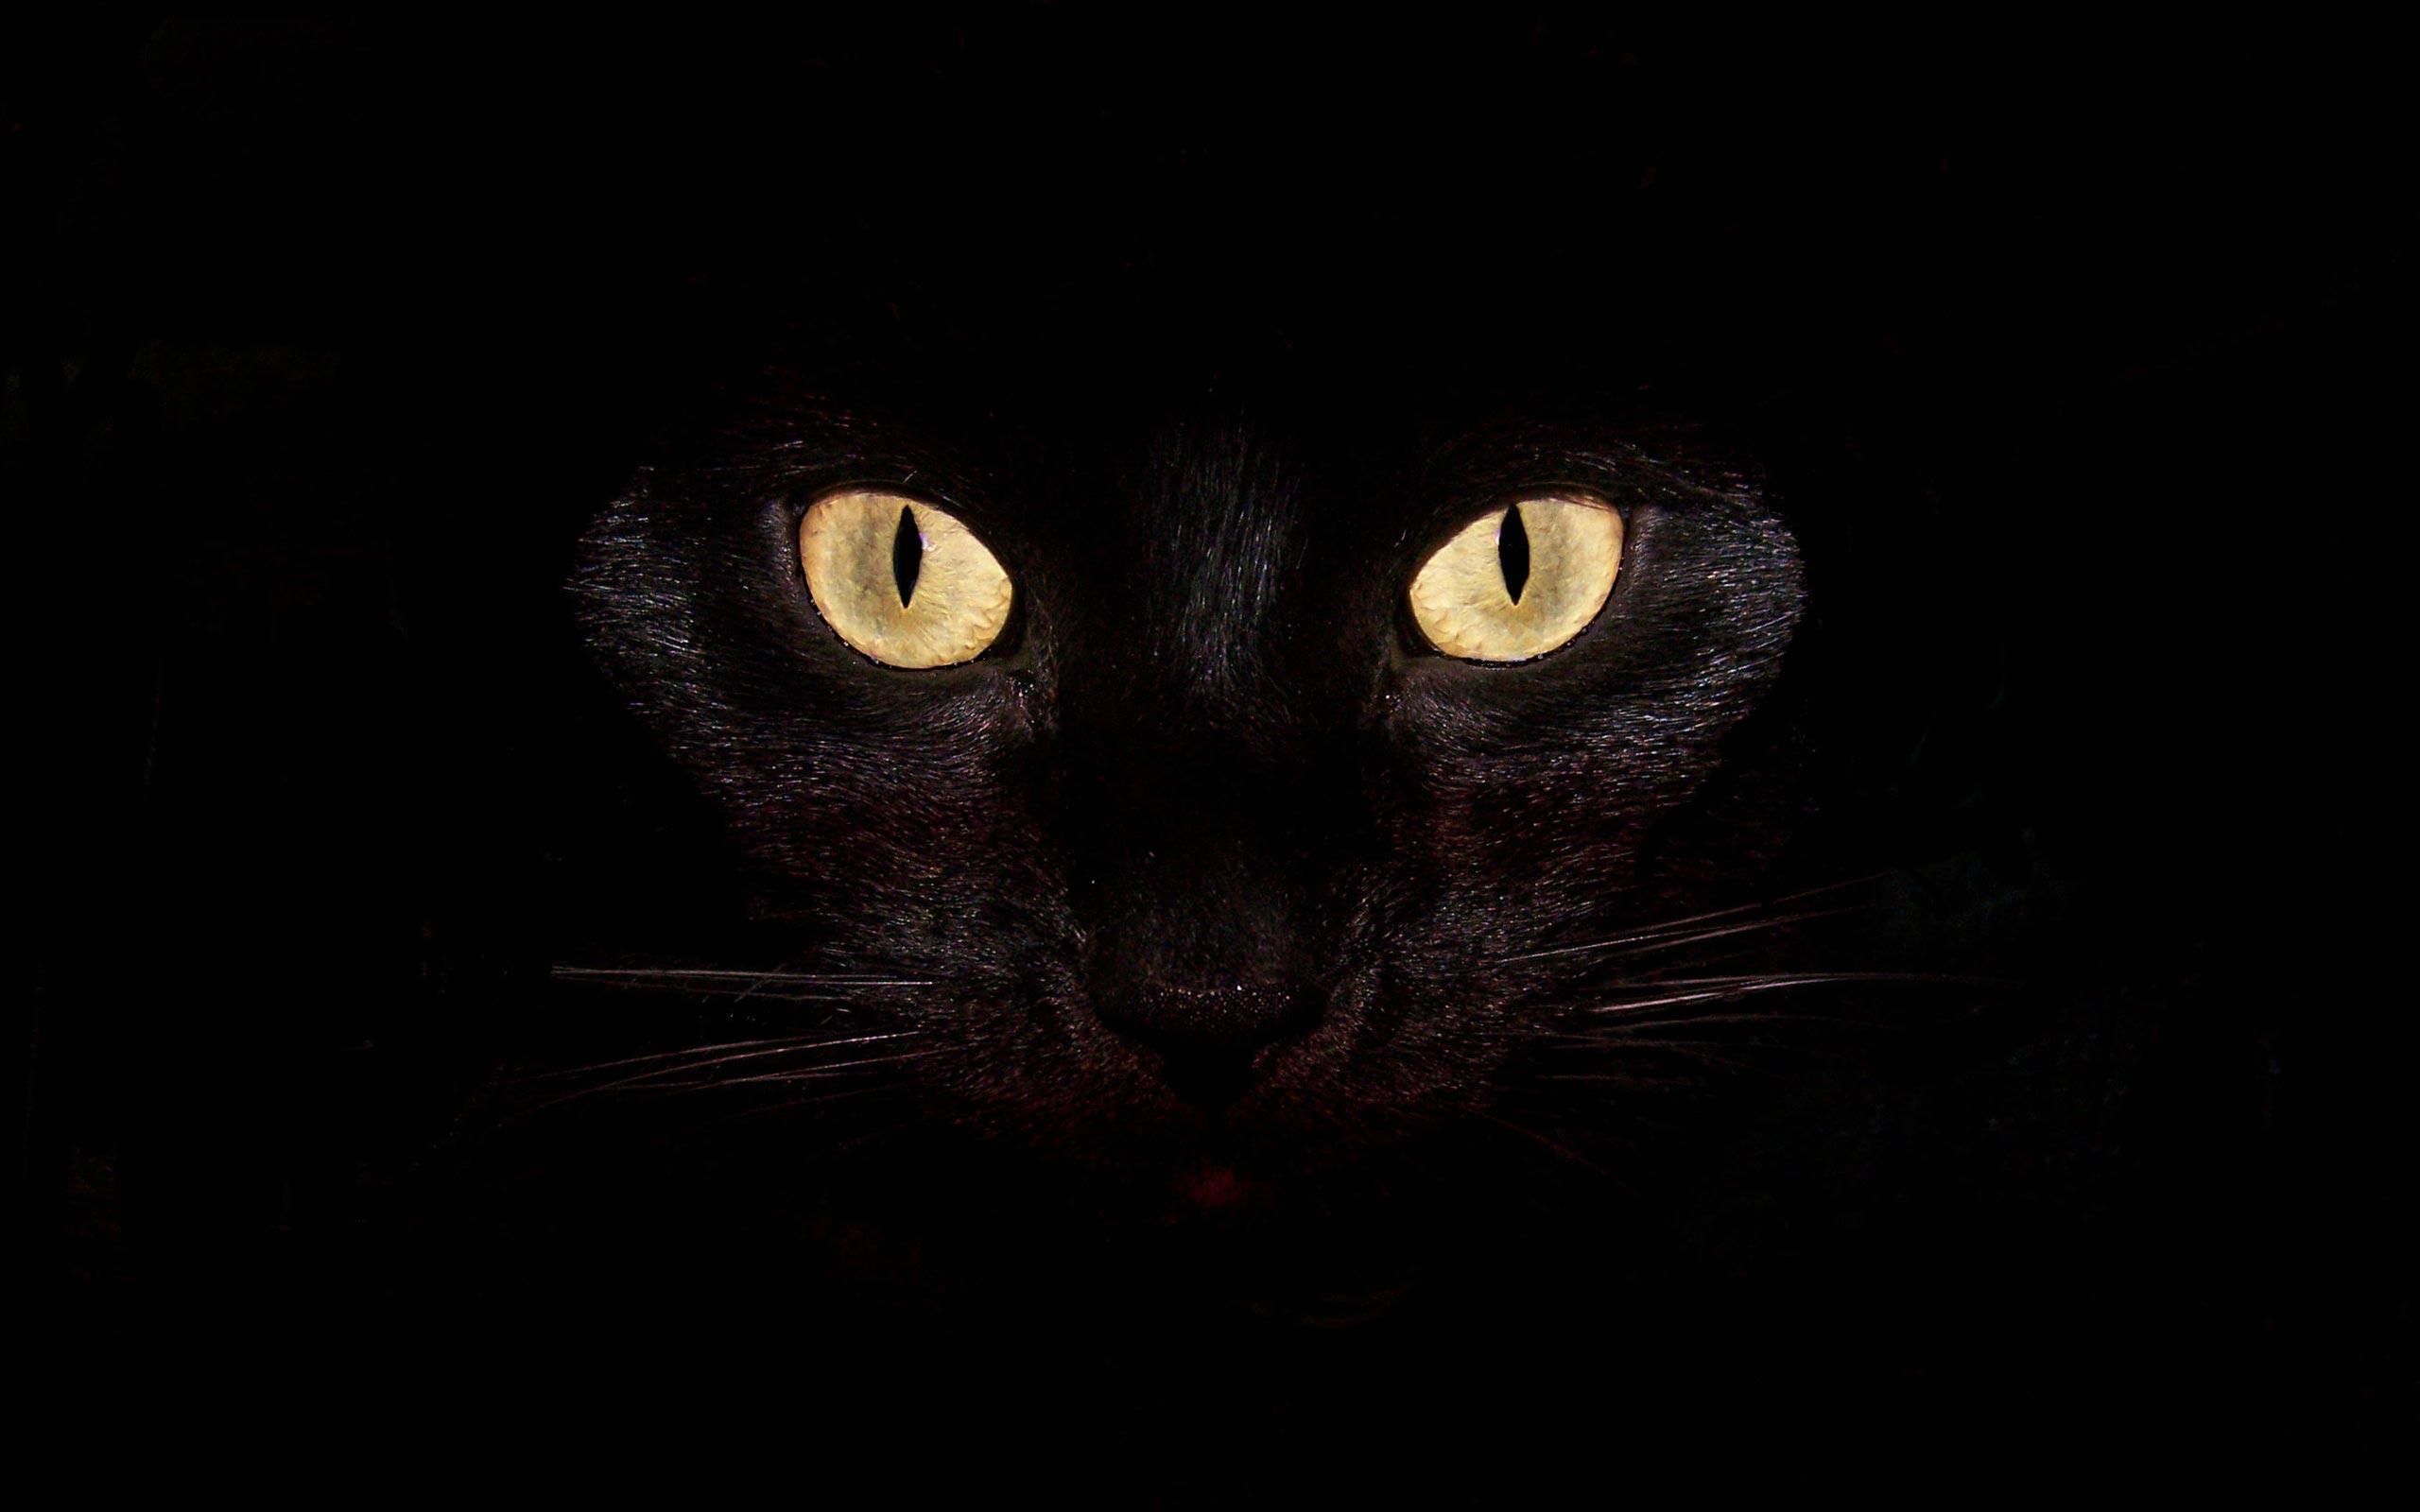 Download Black Cat Desktop Backgrounds Wallpaper | Full HD Wallpapers